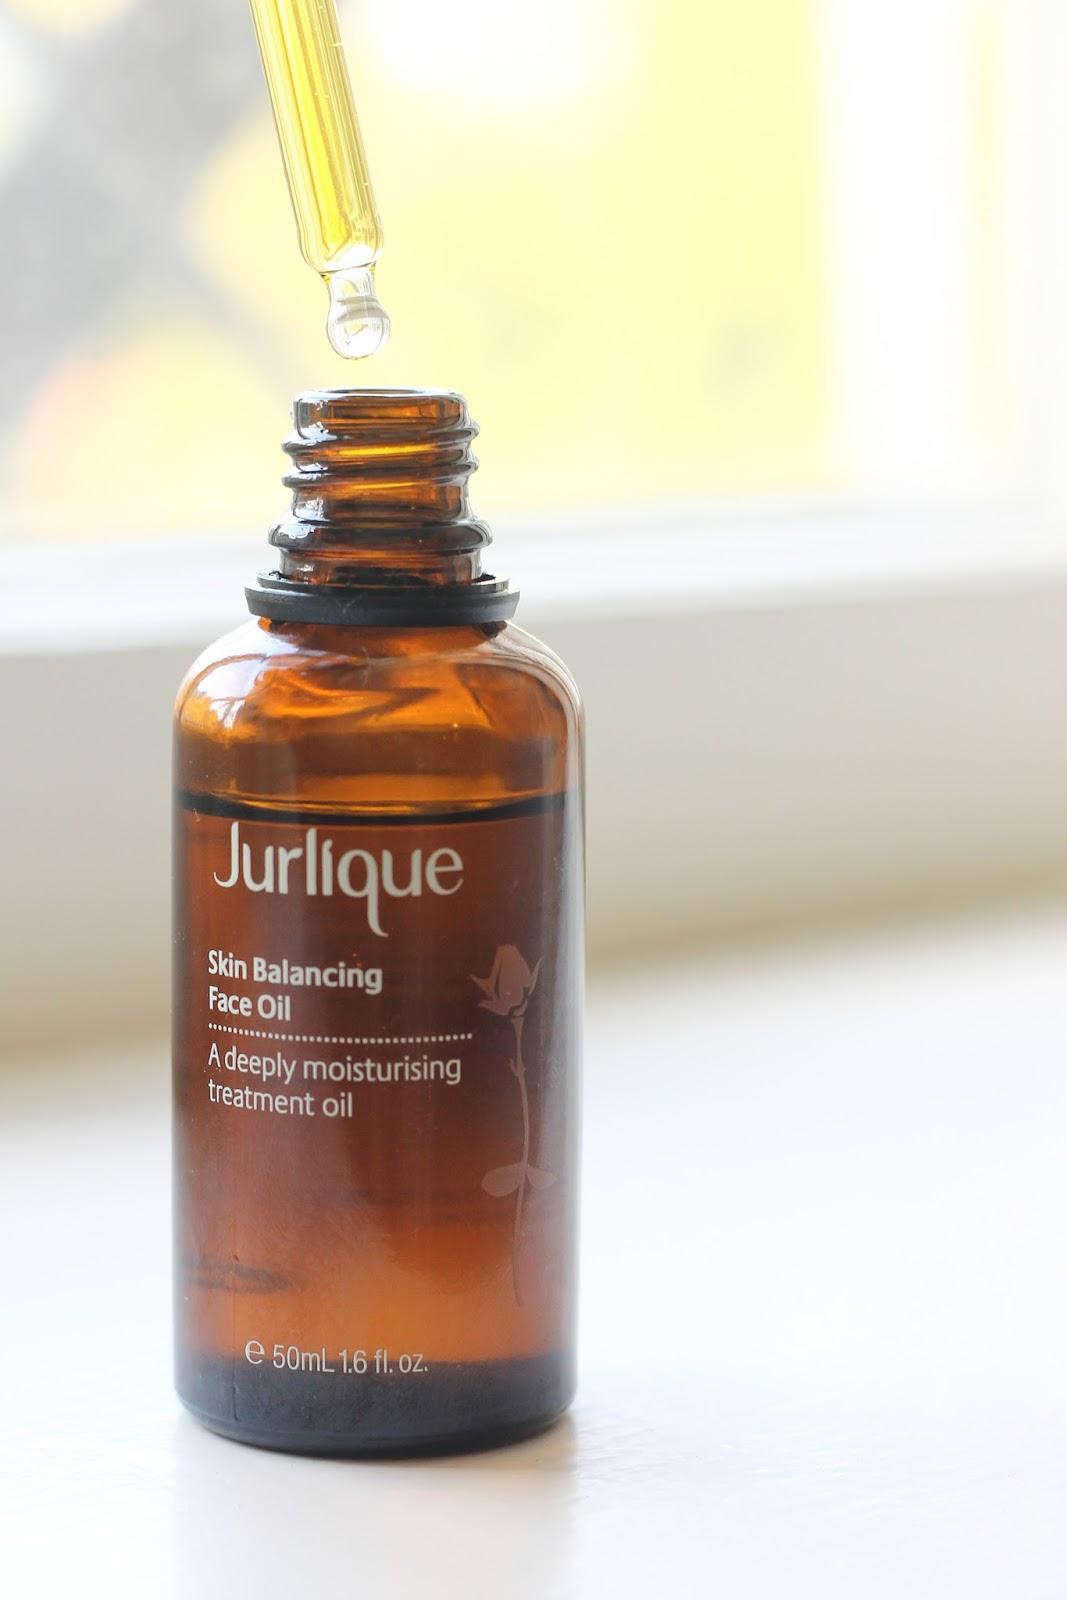 jurlique skin balancing face oil sephora